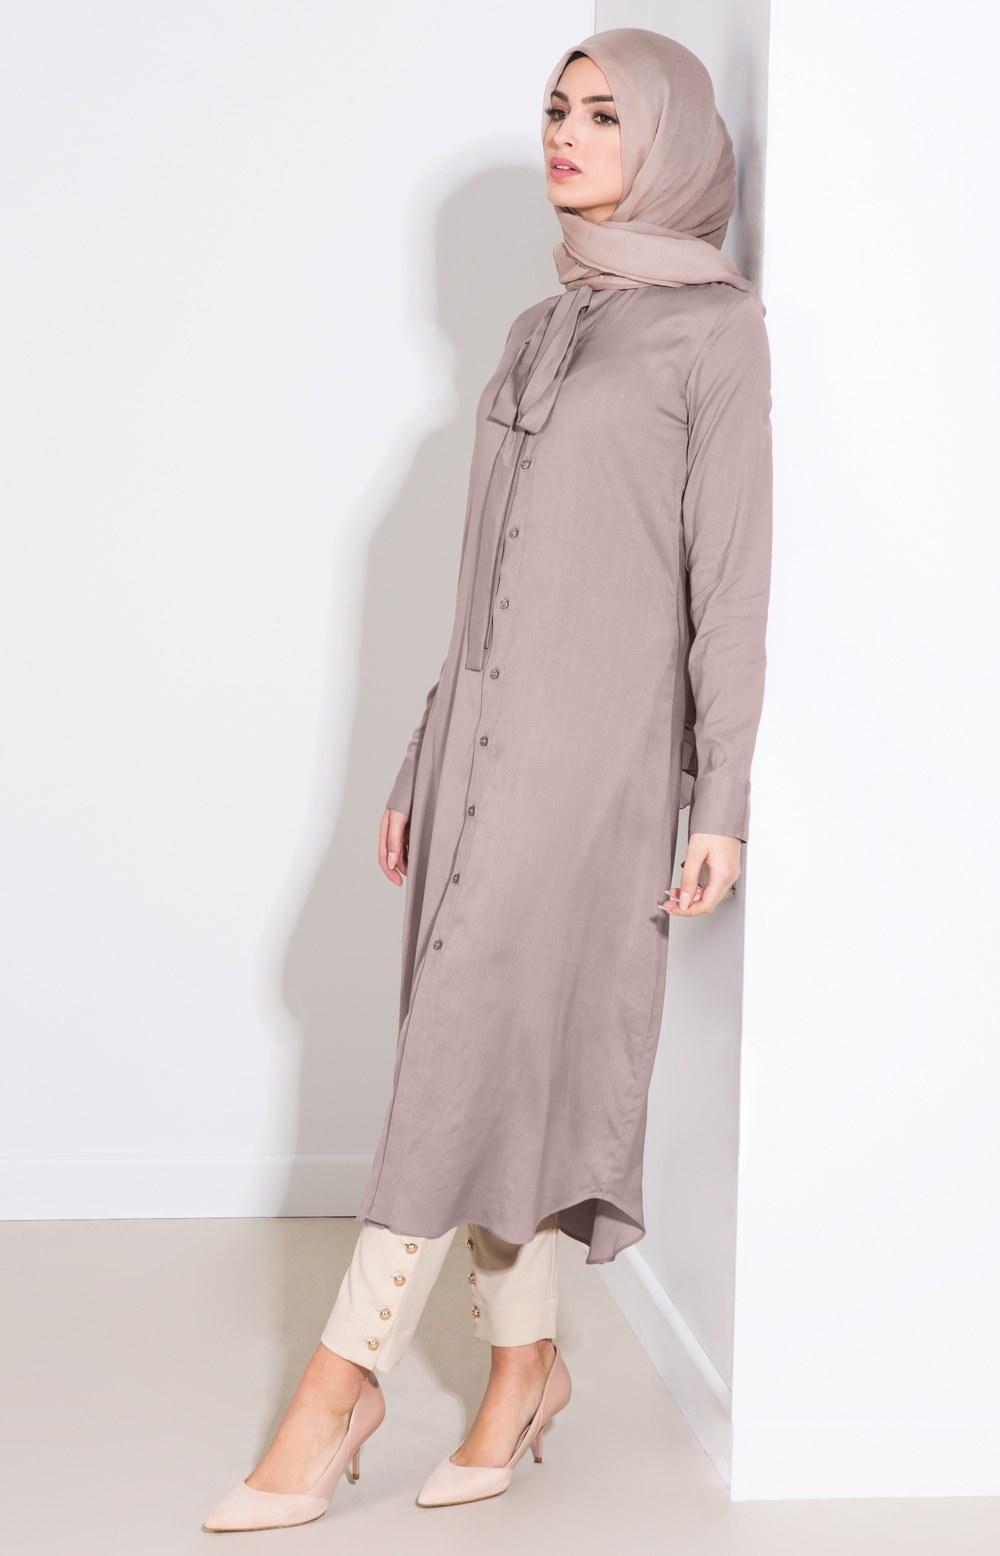 Ide Baju Lebaran Sekarang J7do 25 Trend Model Baju Muslim Lebaran 2018 Simple & Modis